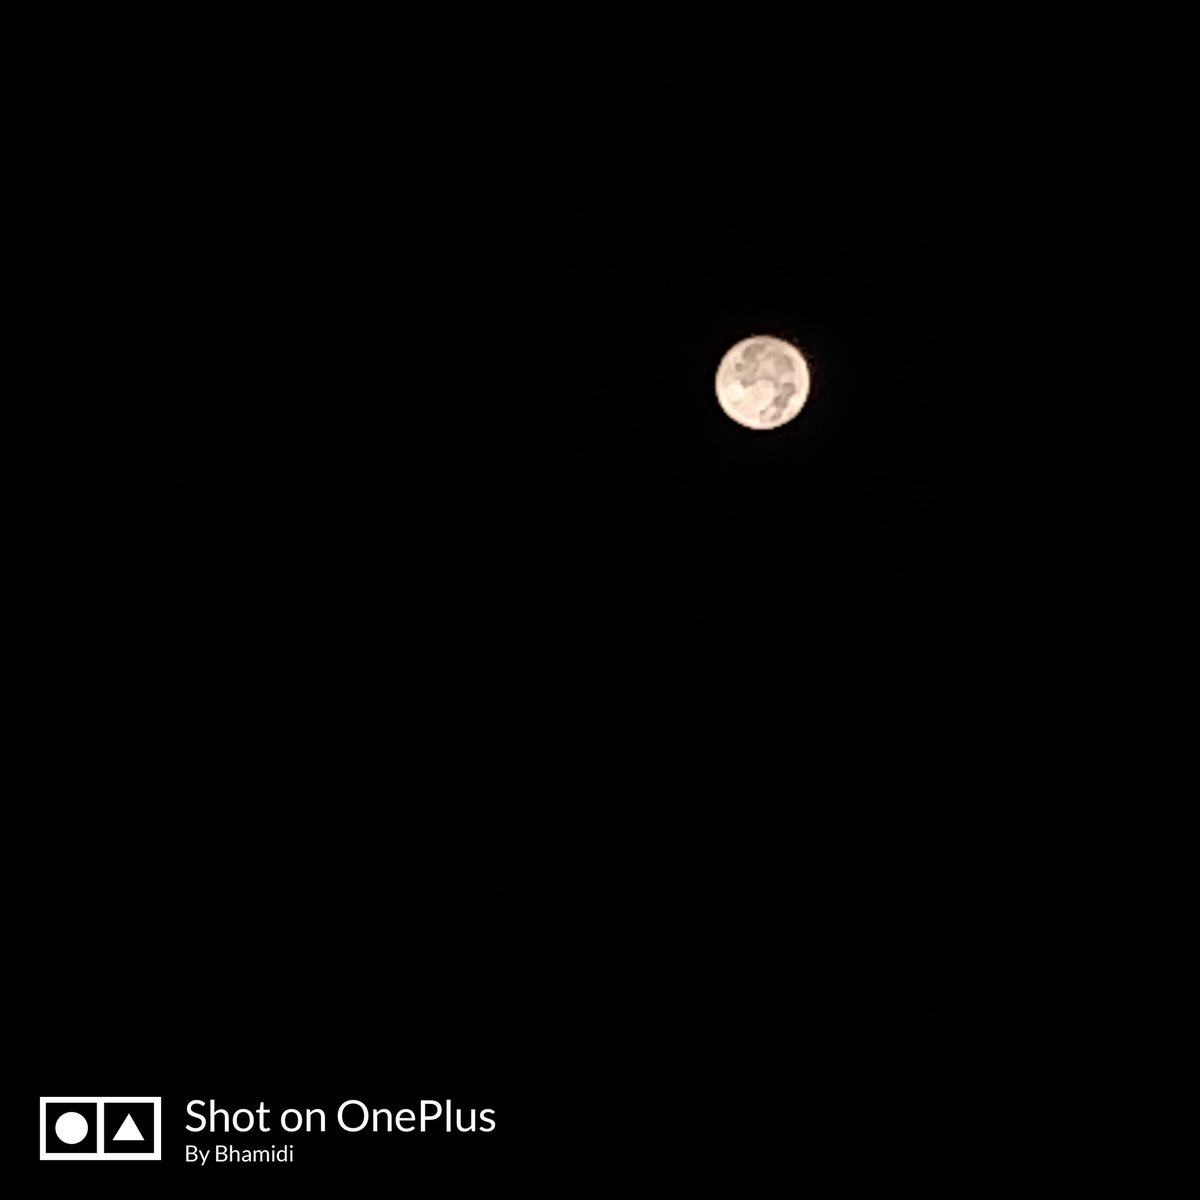 #moon #FullMoon   #Shotononeplus5 #8x